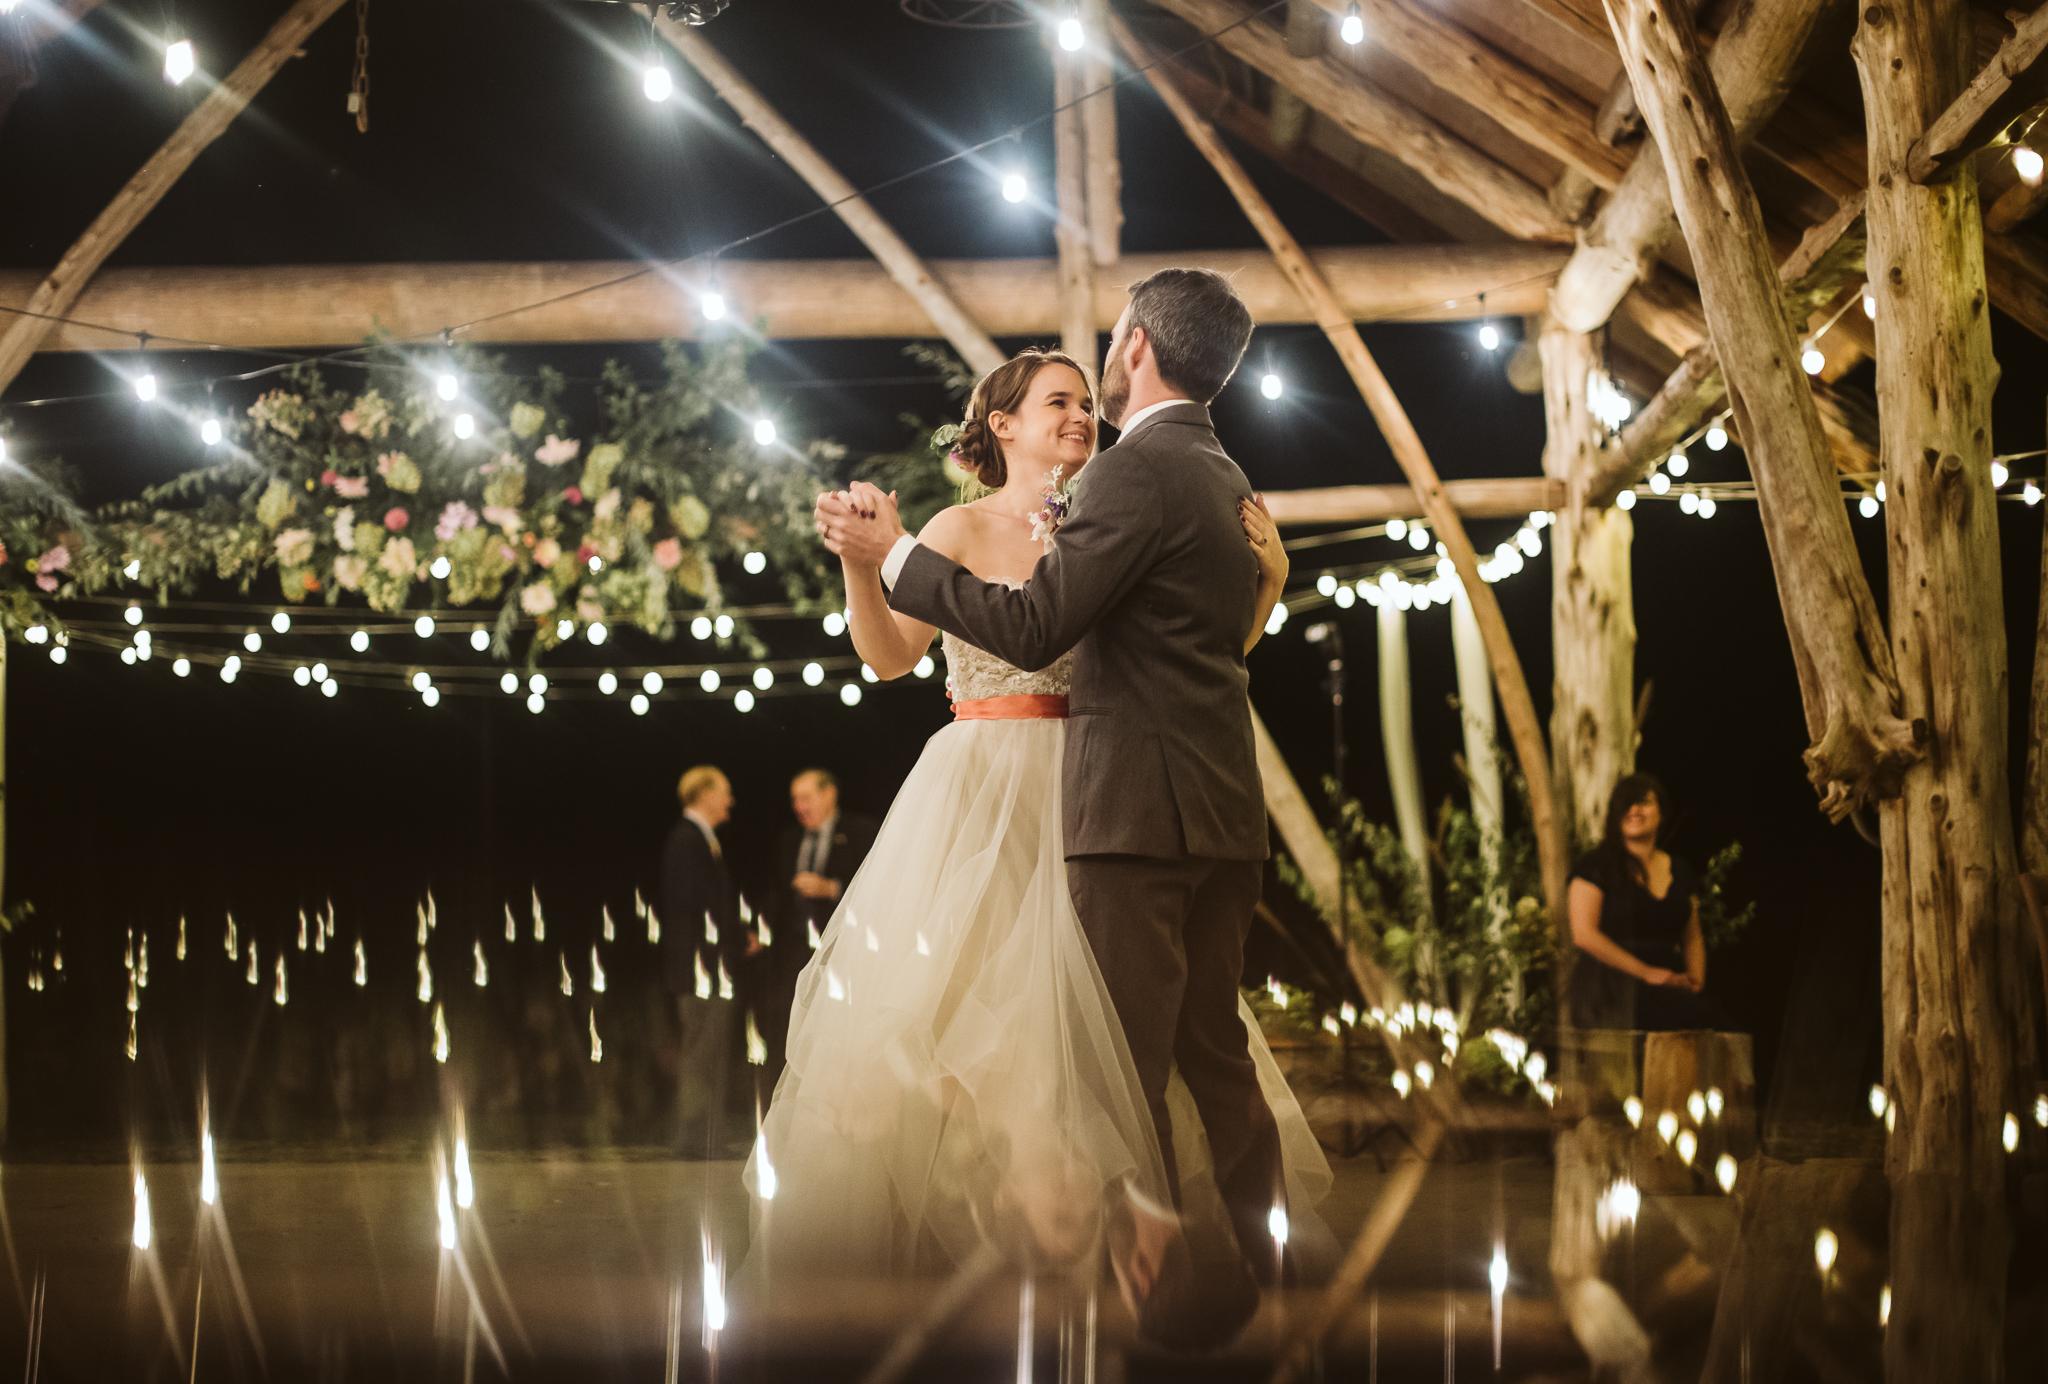 Wollam_gardens_wedding81.JPG